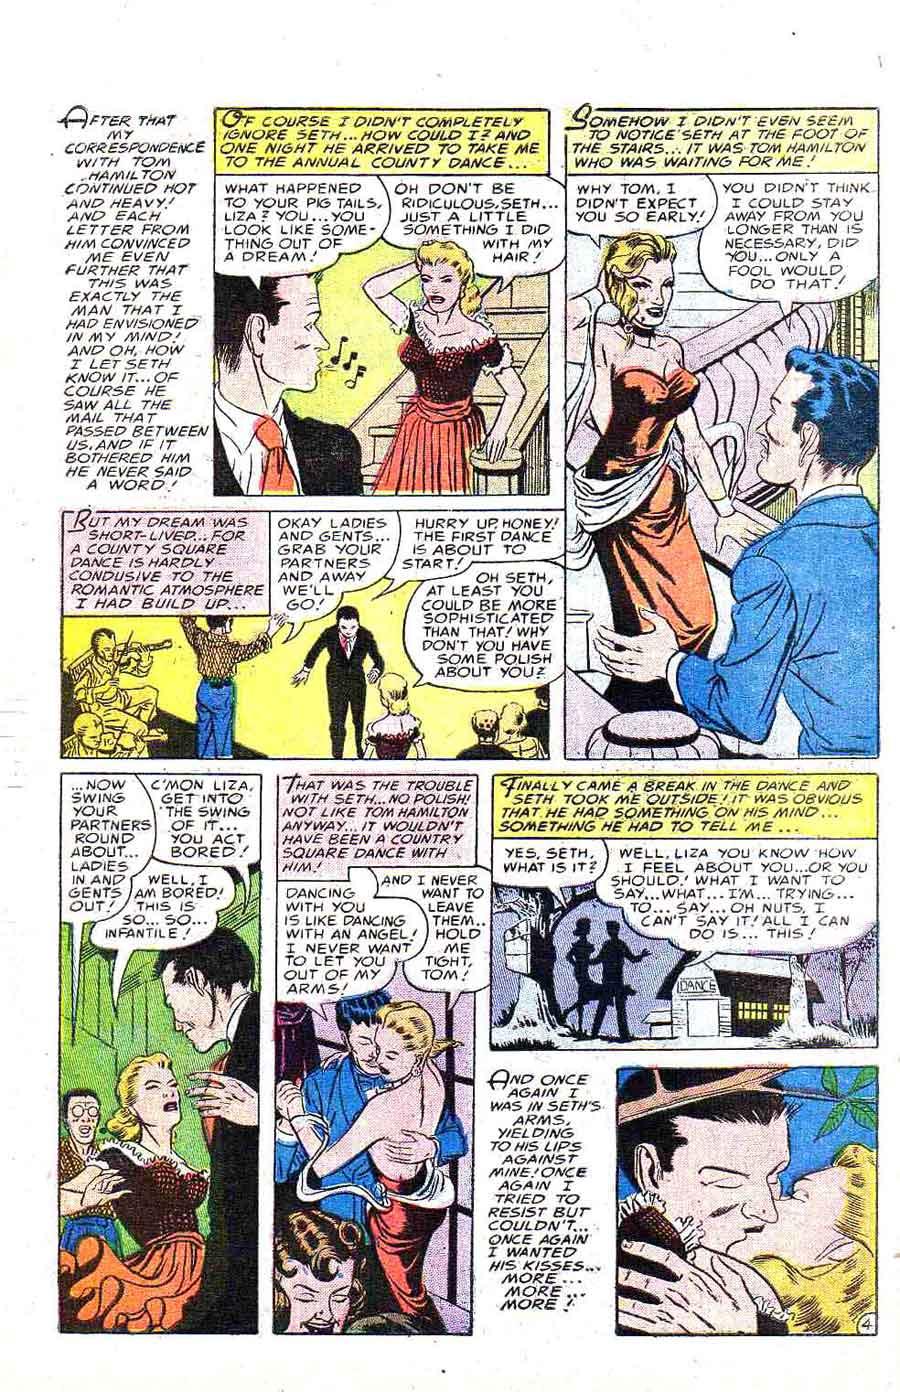 Daring Love v1 #1 - Steve Ditko golden age romance comic book page art